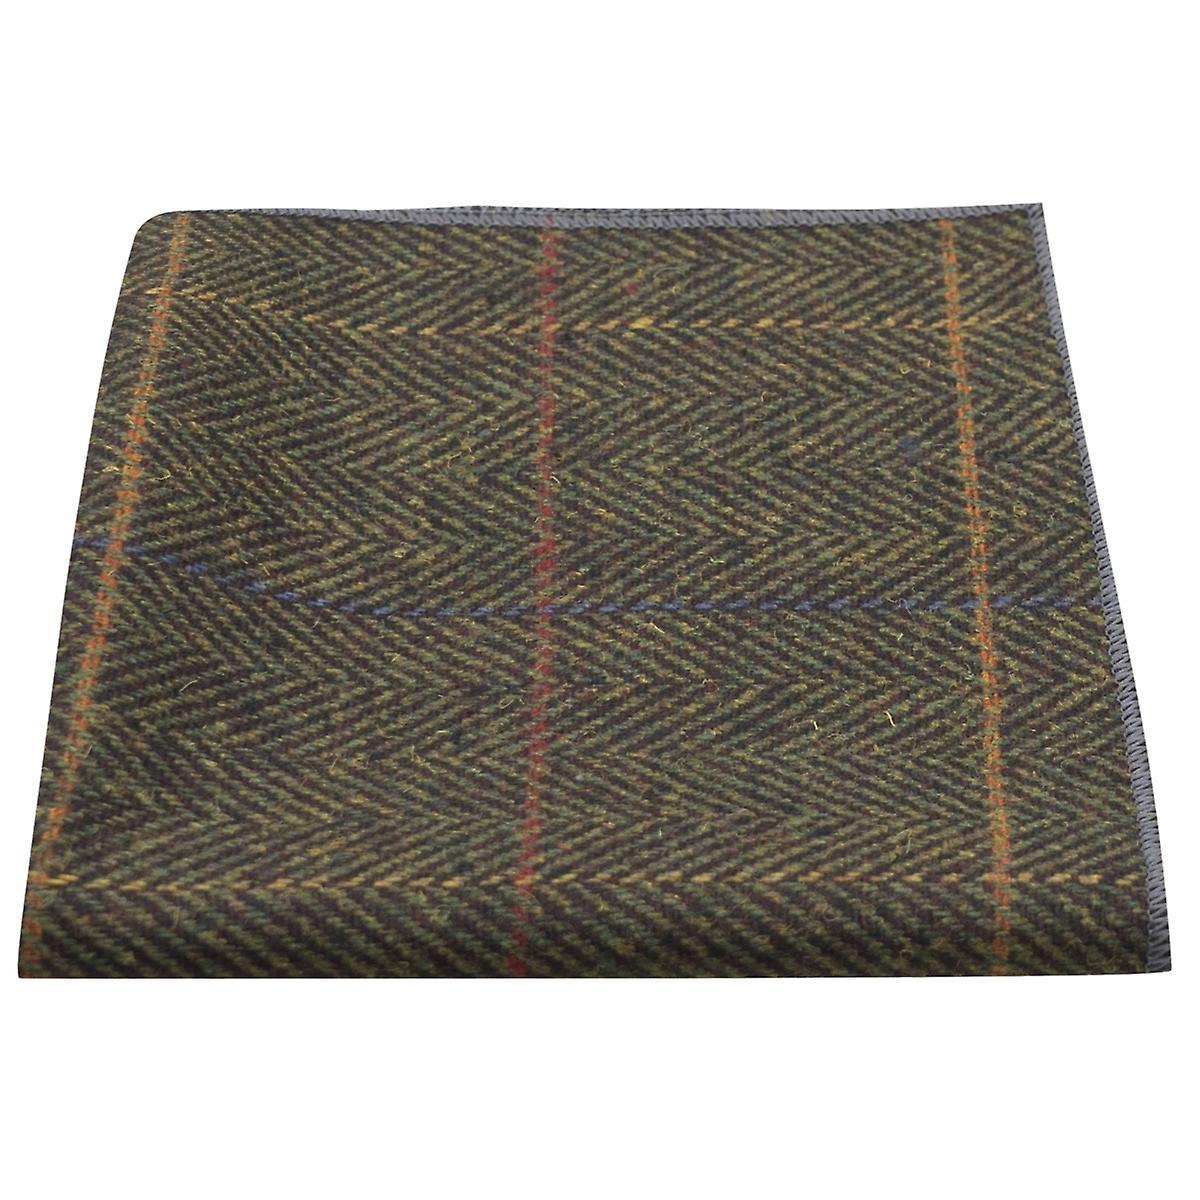 Luxury Dark Olive Green Herringbone Check Pocket Square, Handkerchief, Tweed